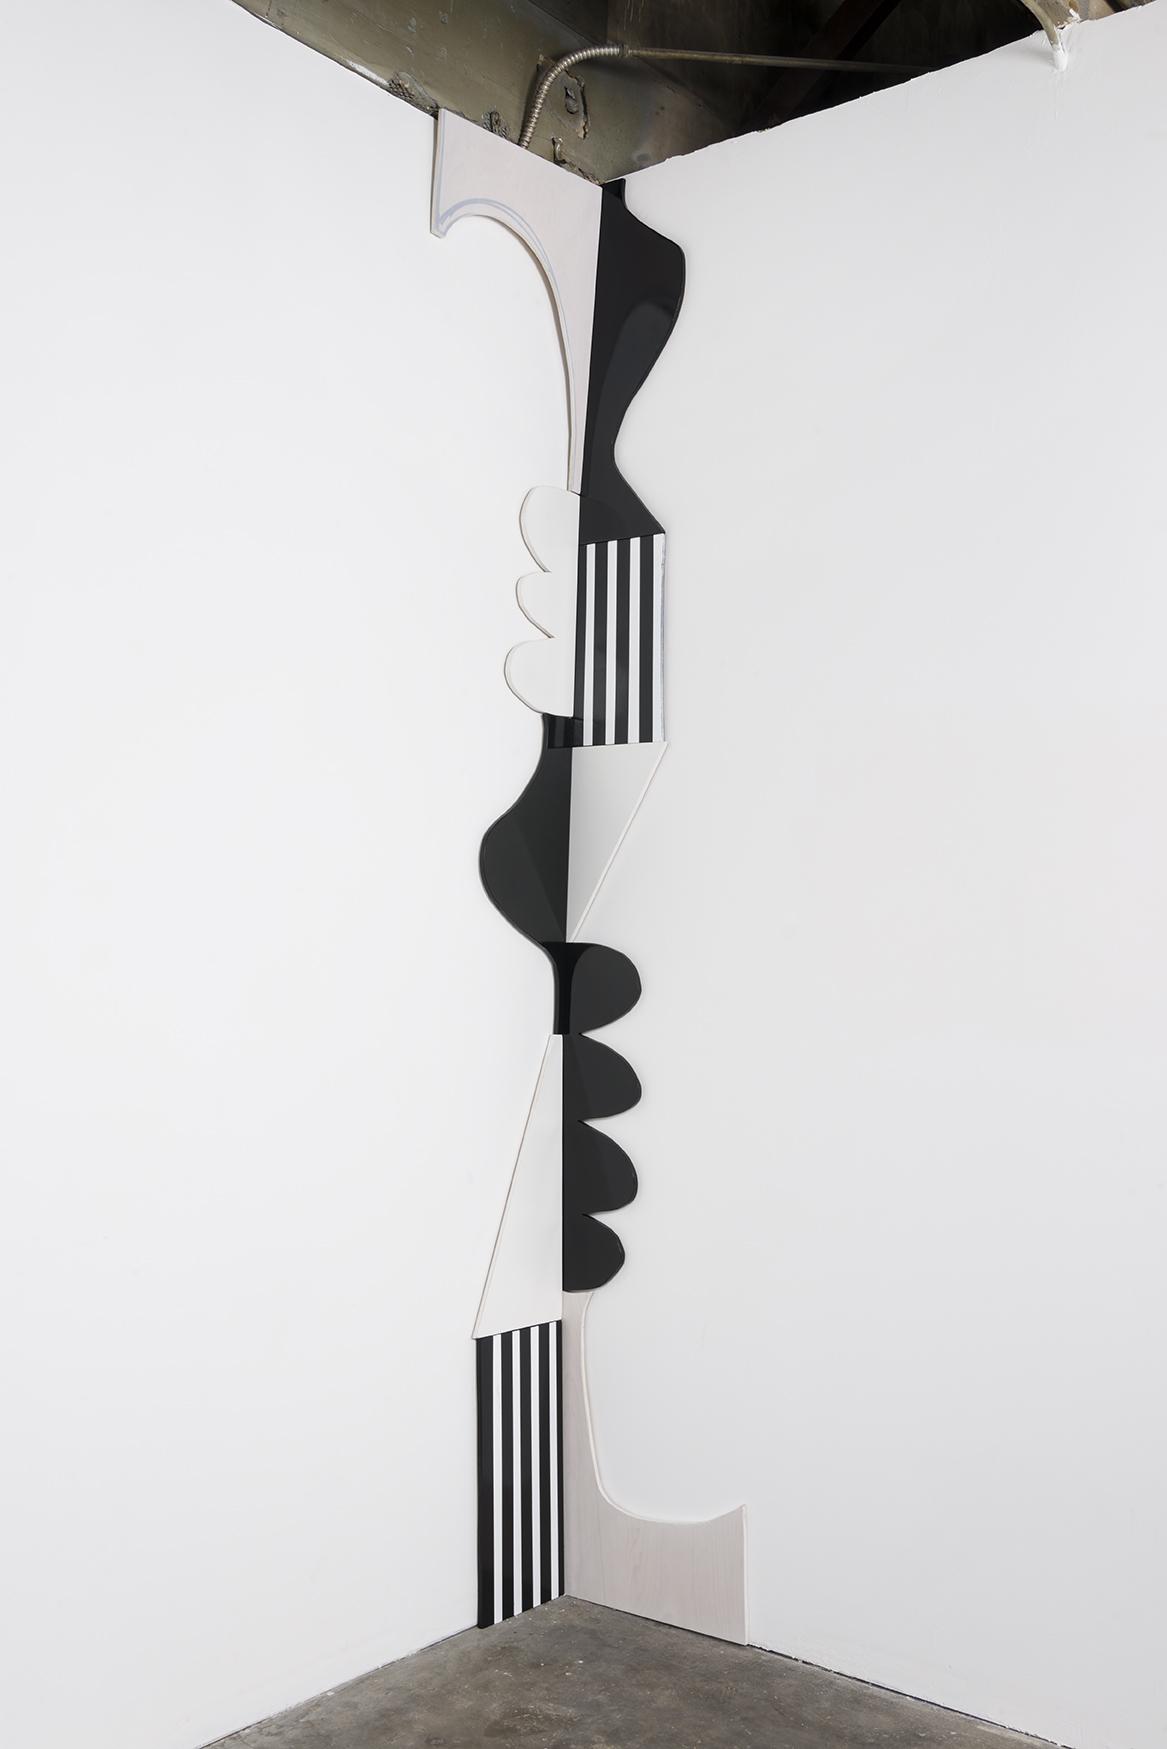 "Nora Shields - Corner Piece 3 (Halfbox) - 2016 - Acrylic, Plywood, Latex Enamel - Lacquer - 118 x 28 x .5"""